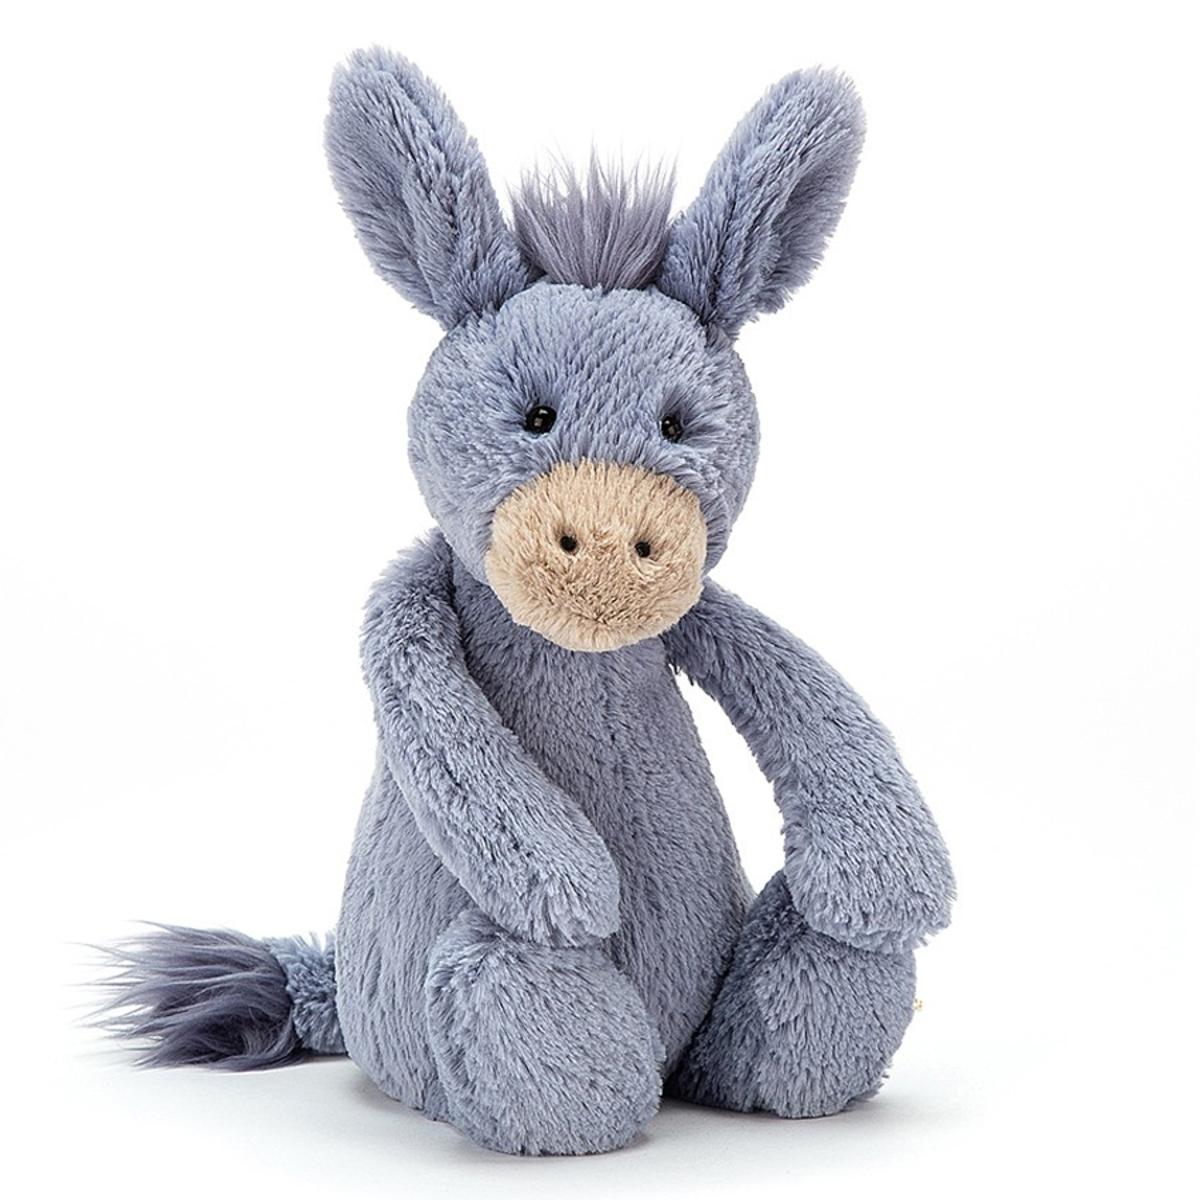 Peluche Bashful Donkey - Medium Bashful Donkey - Medium